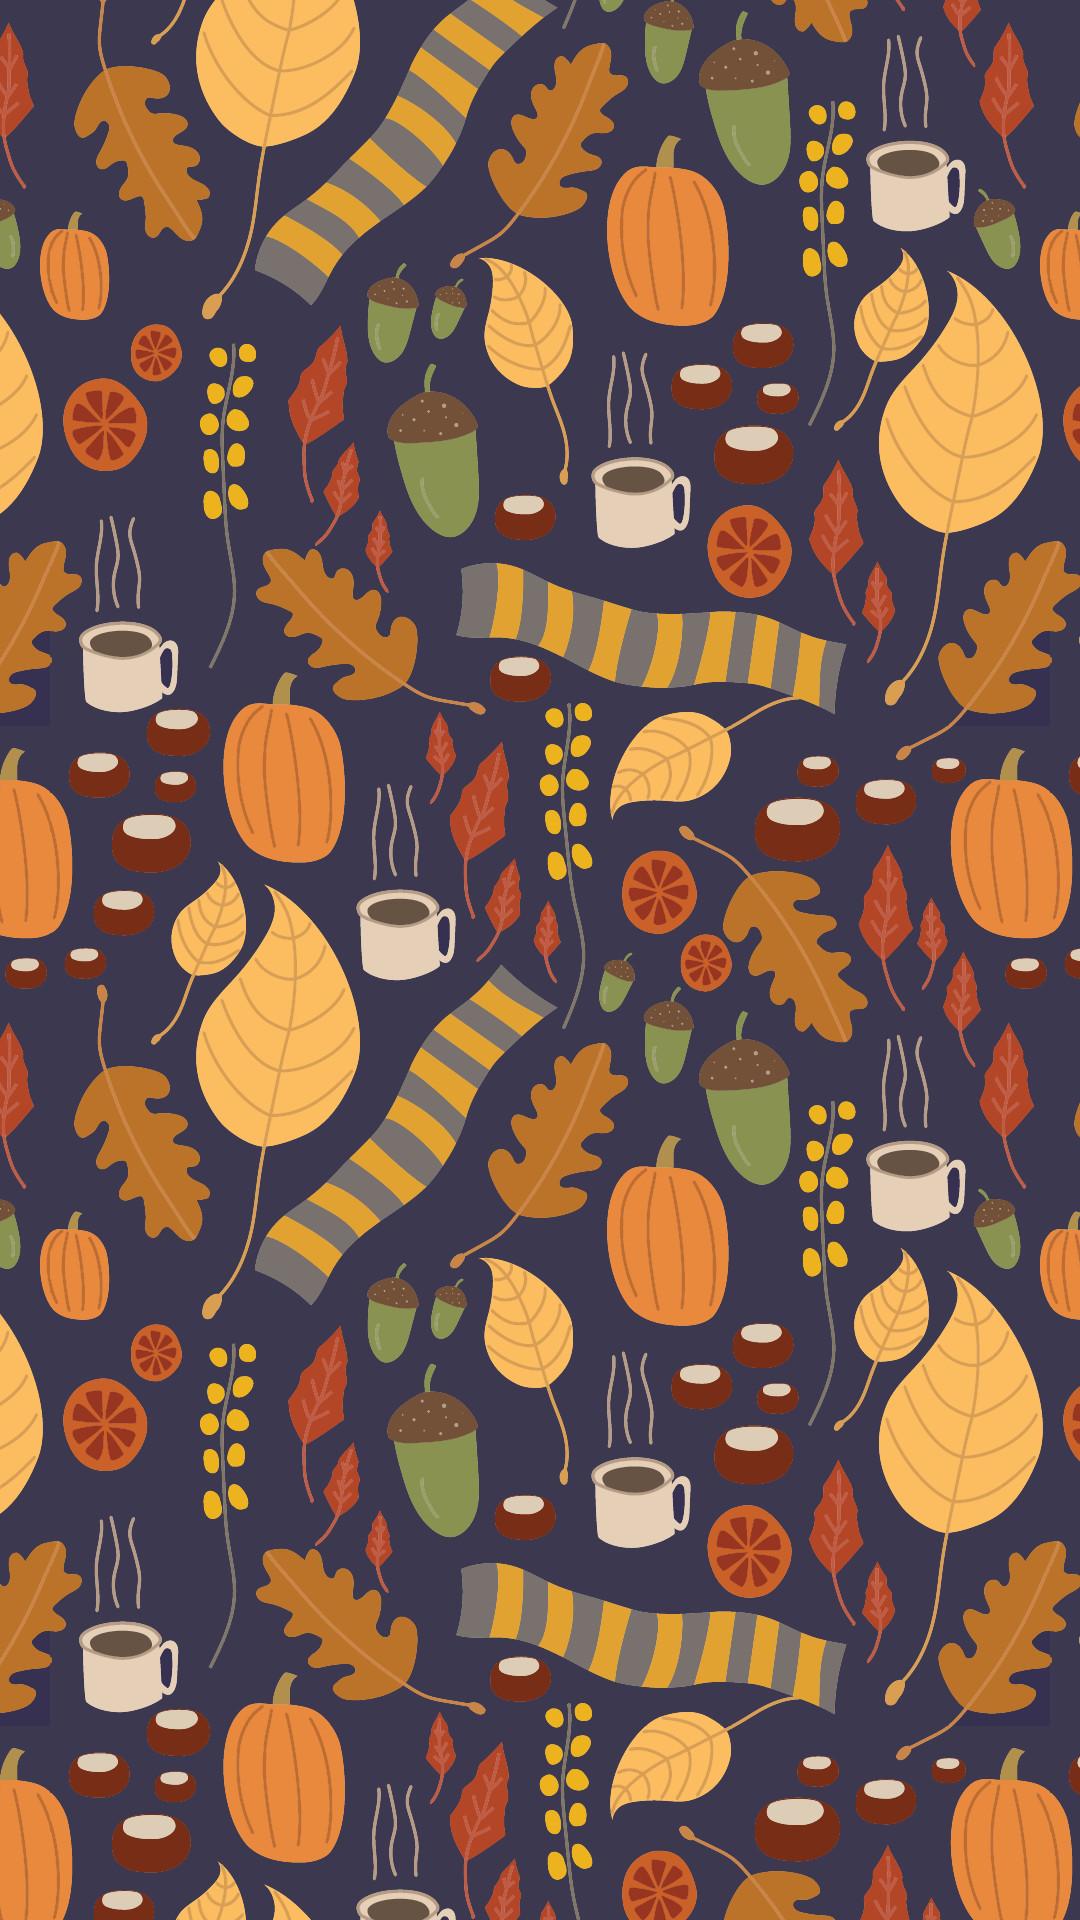 Autumn 2016 Wallpaper – Variant 1